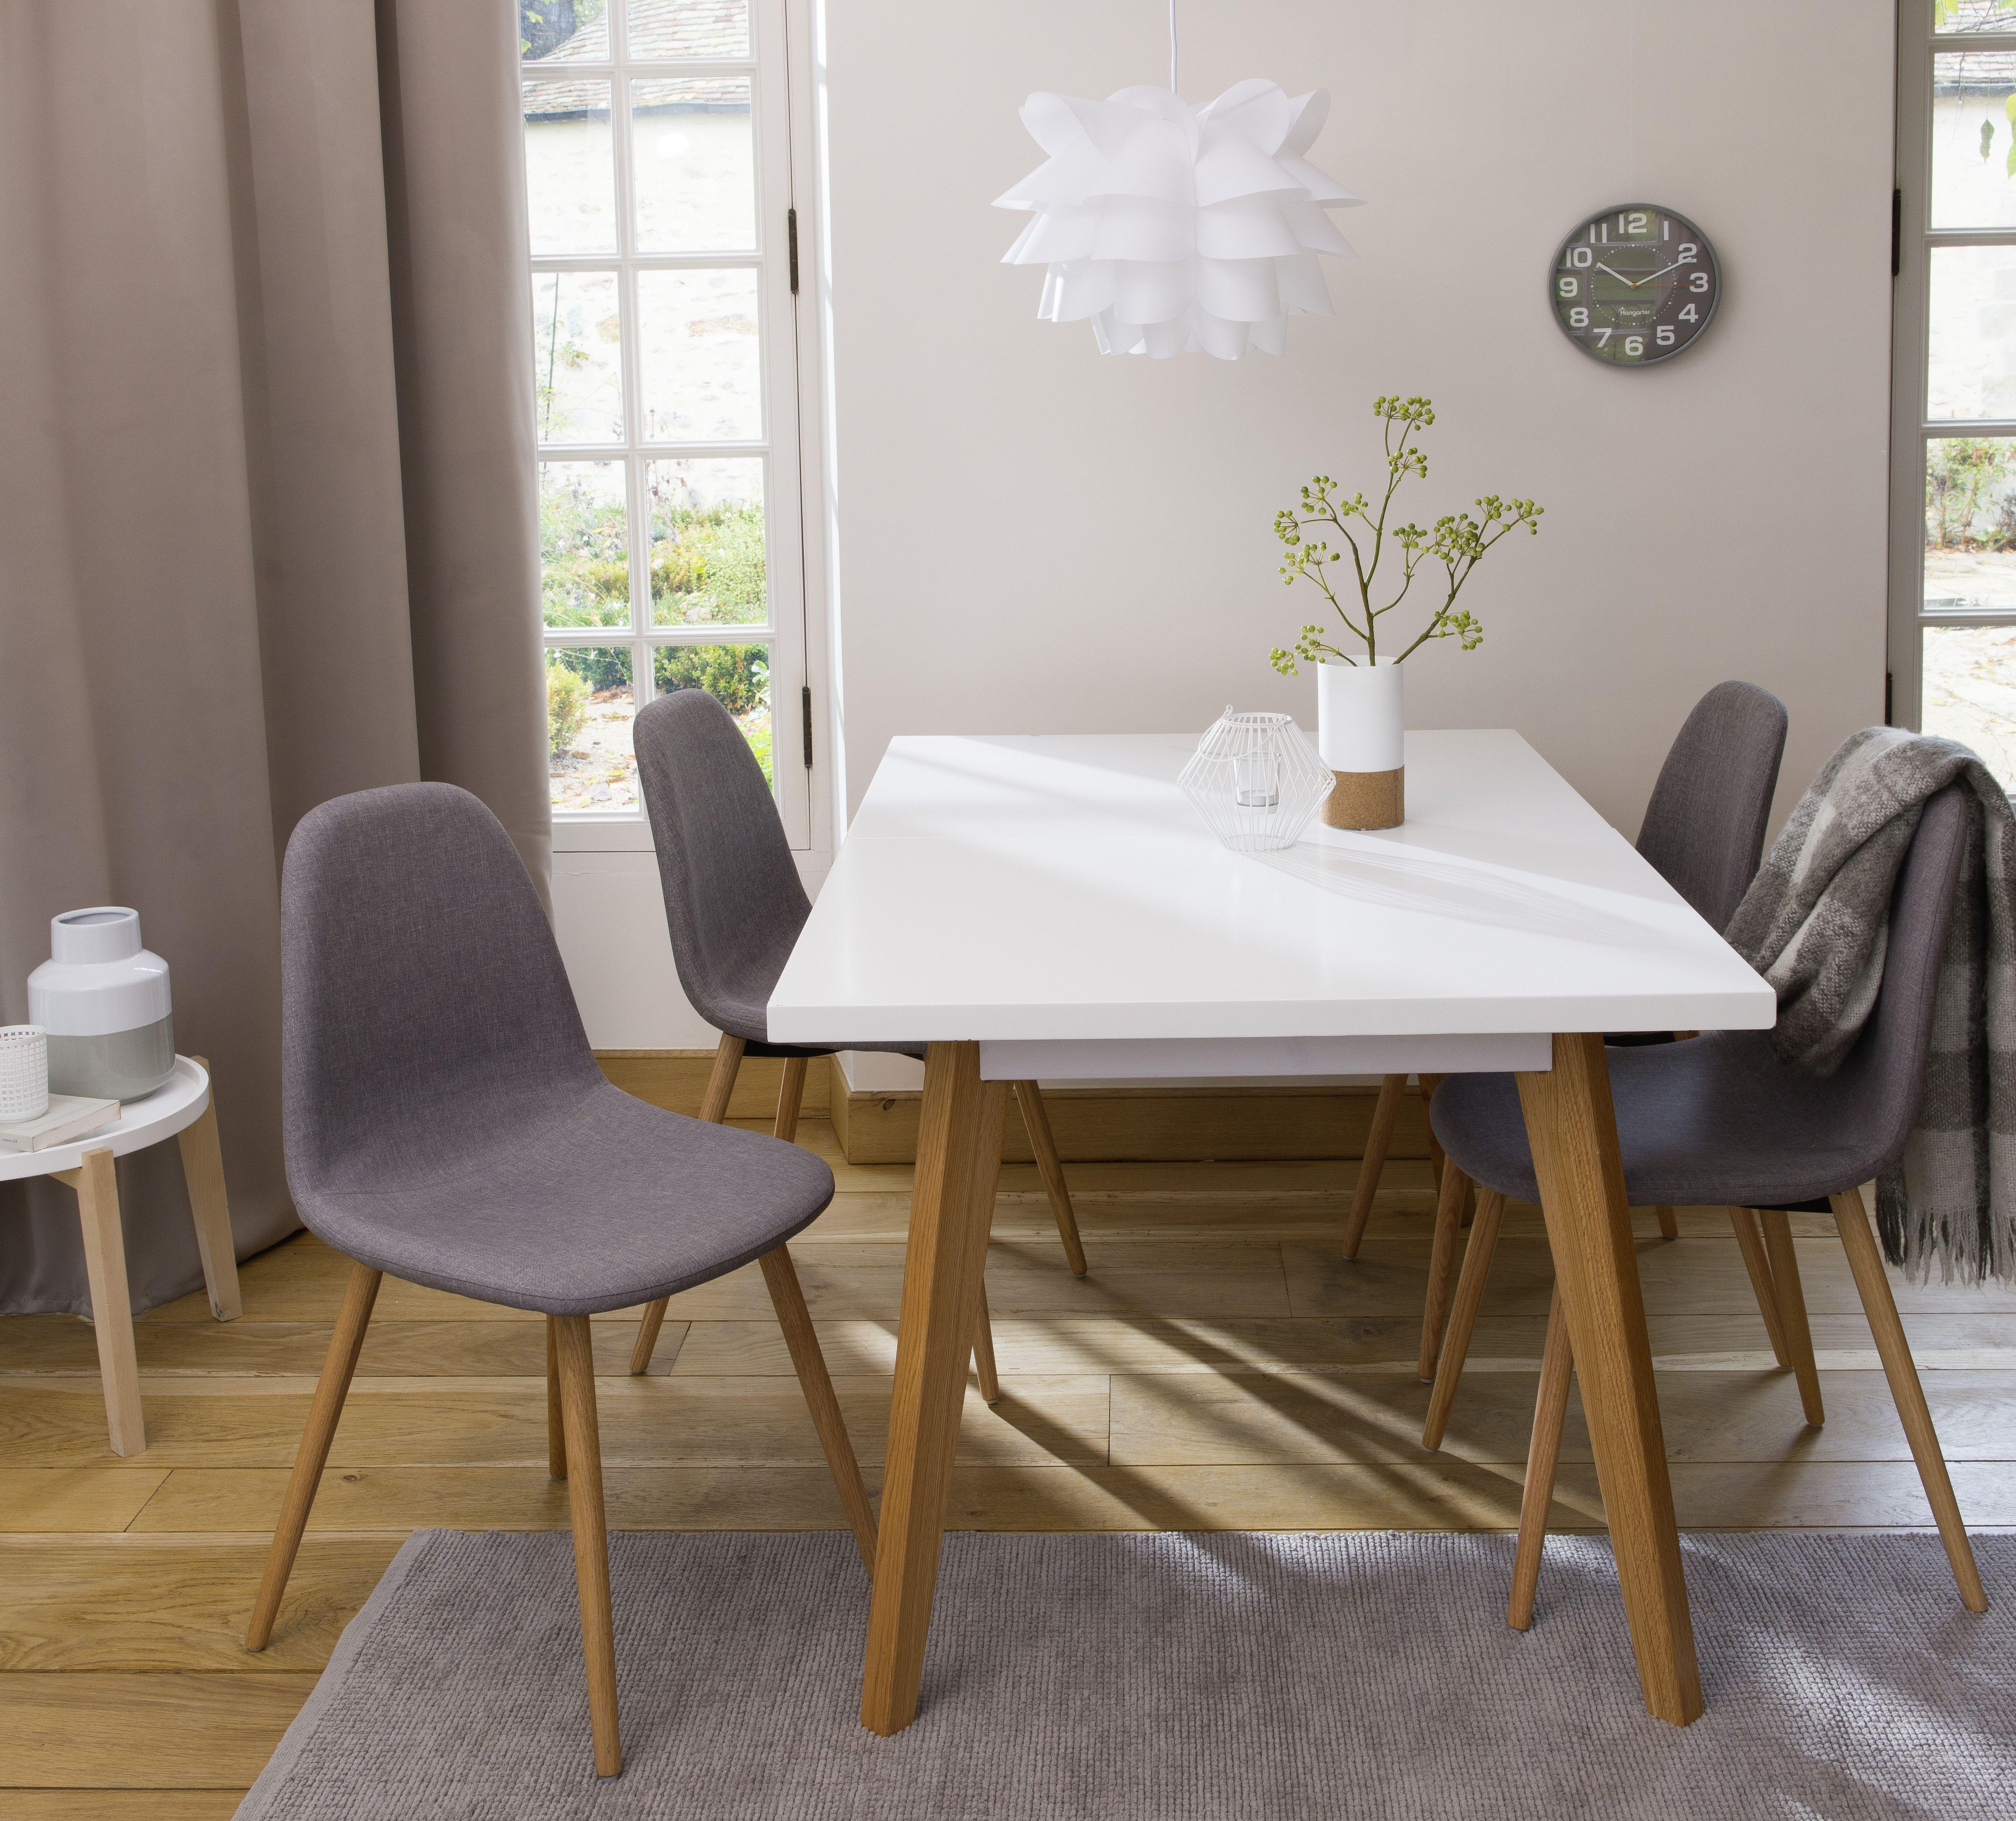 salle a manger design table laquee blanche chaise en tissu avec pieds en pin massif salle a manger moderne salle a manger design decoration salle a manger